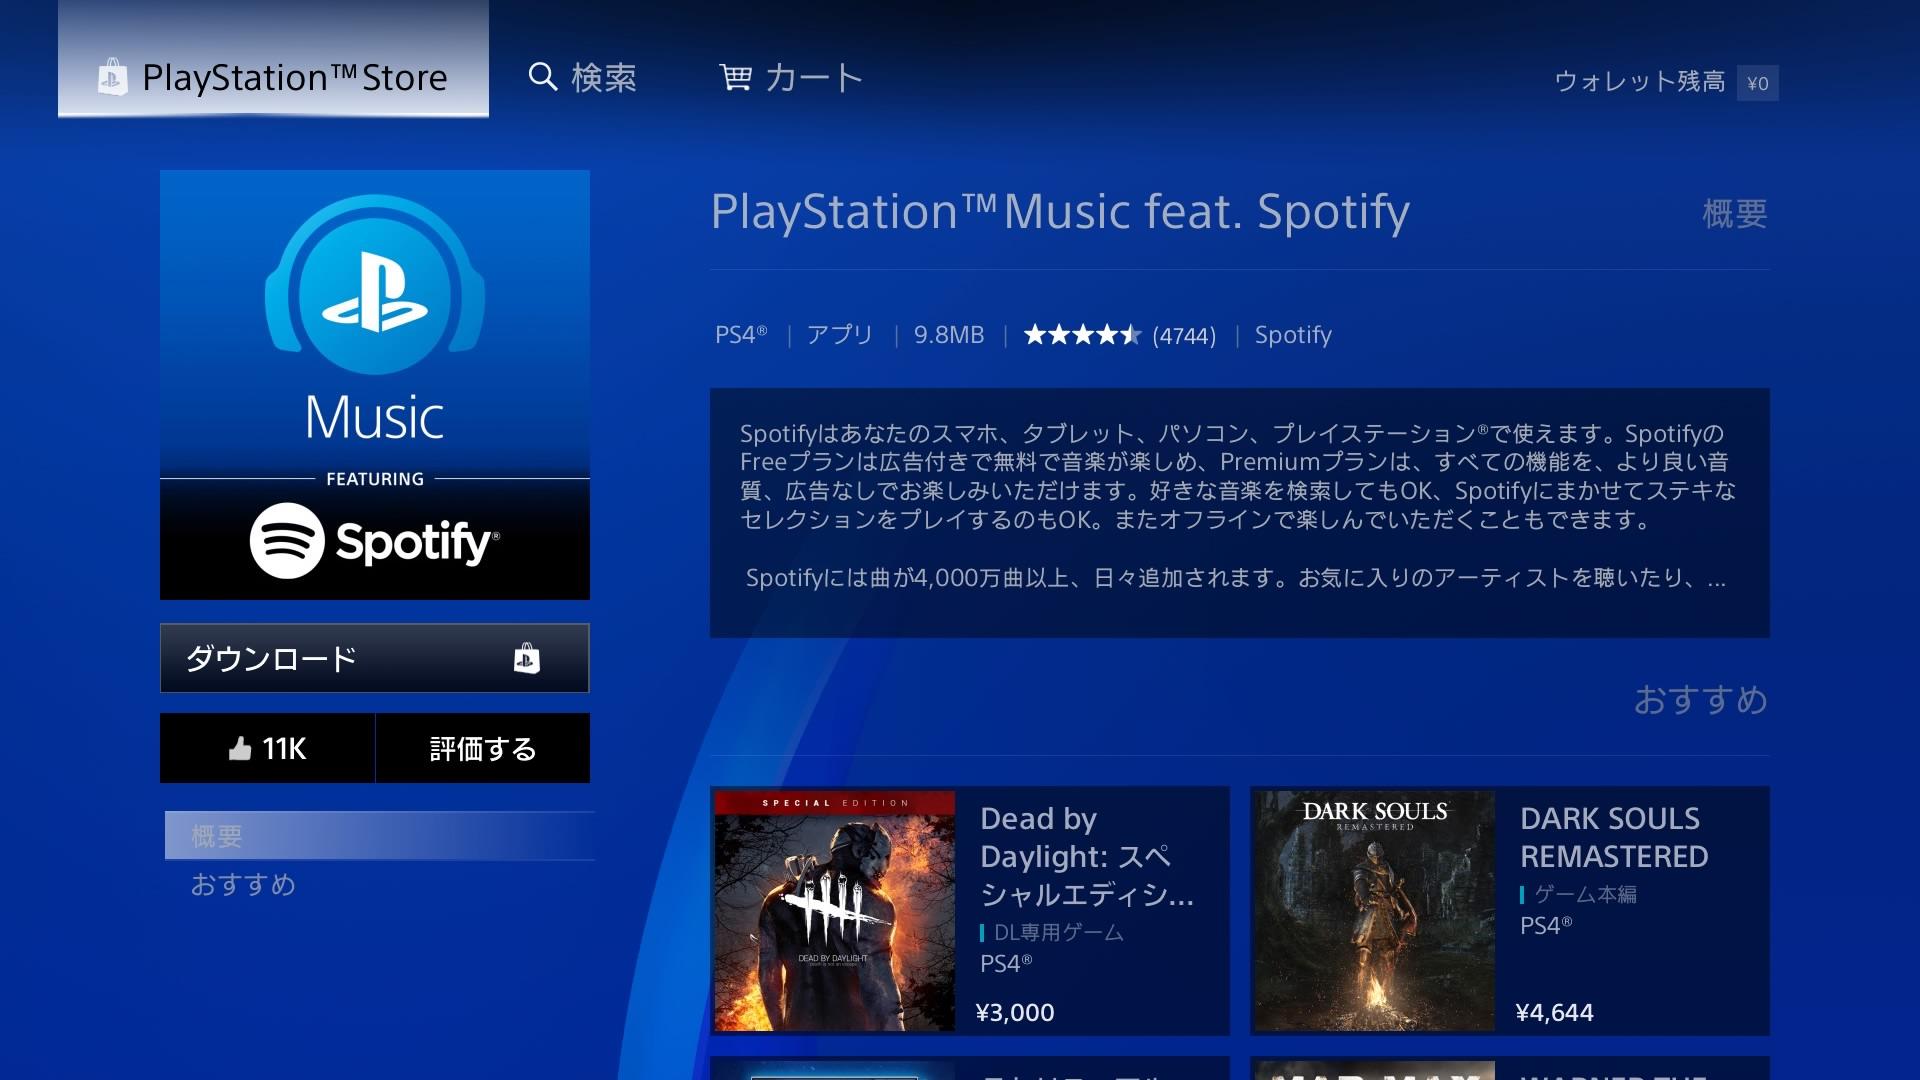 PS4で音楽を聴く方法